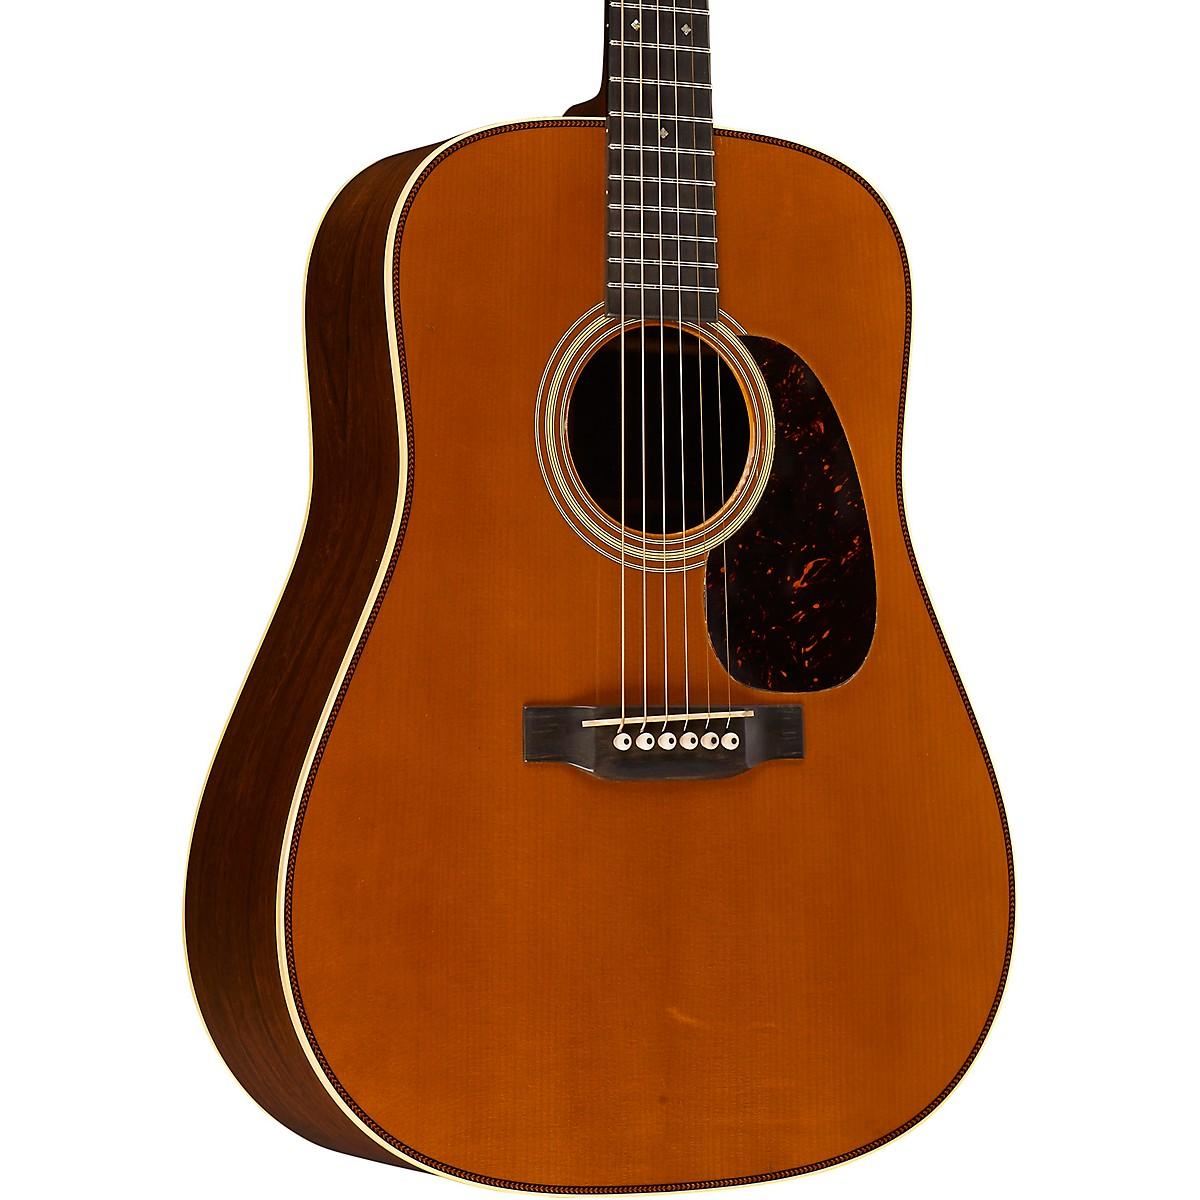 Martin D-28 Authentic 1937 VTS Aged Dreadnought Acoustic Guitar